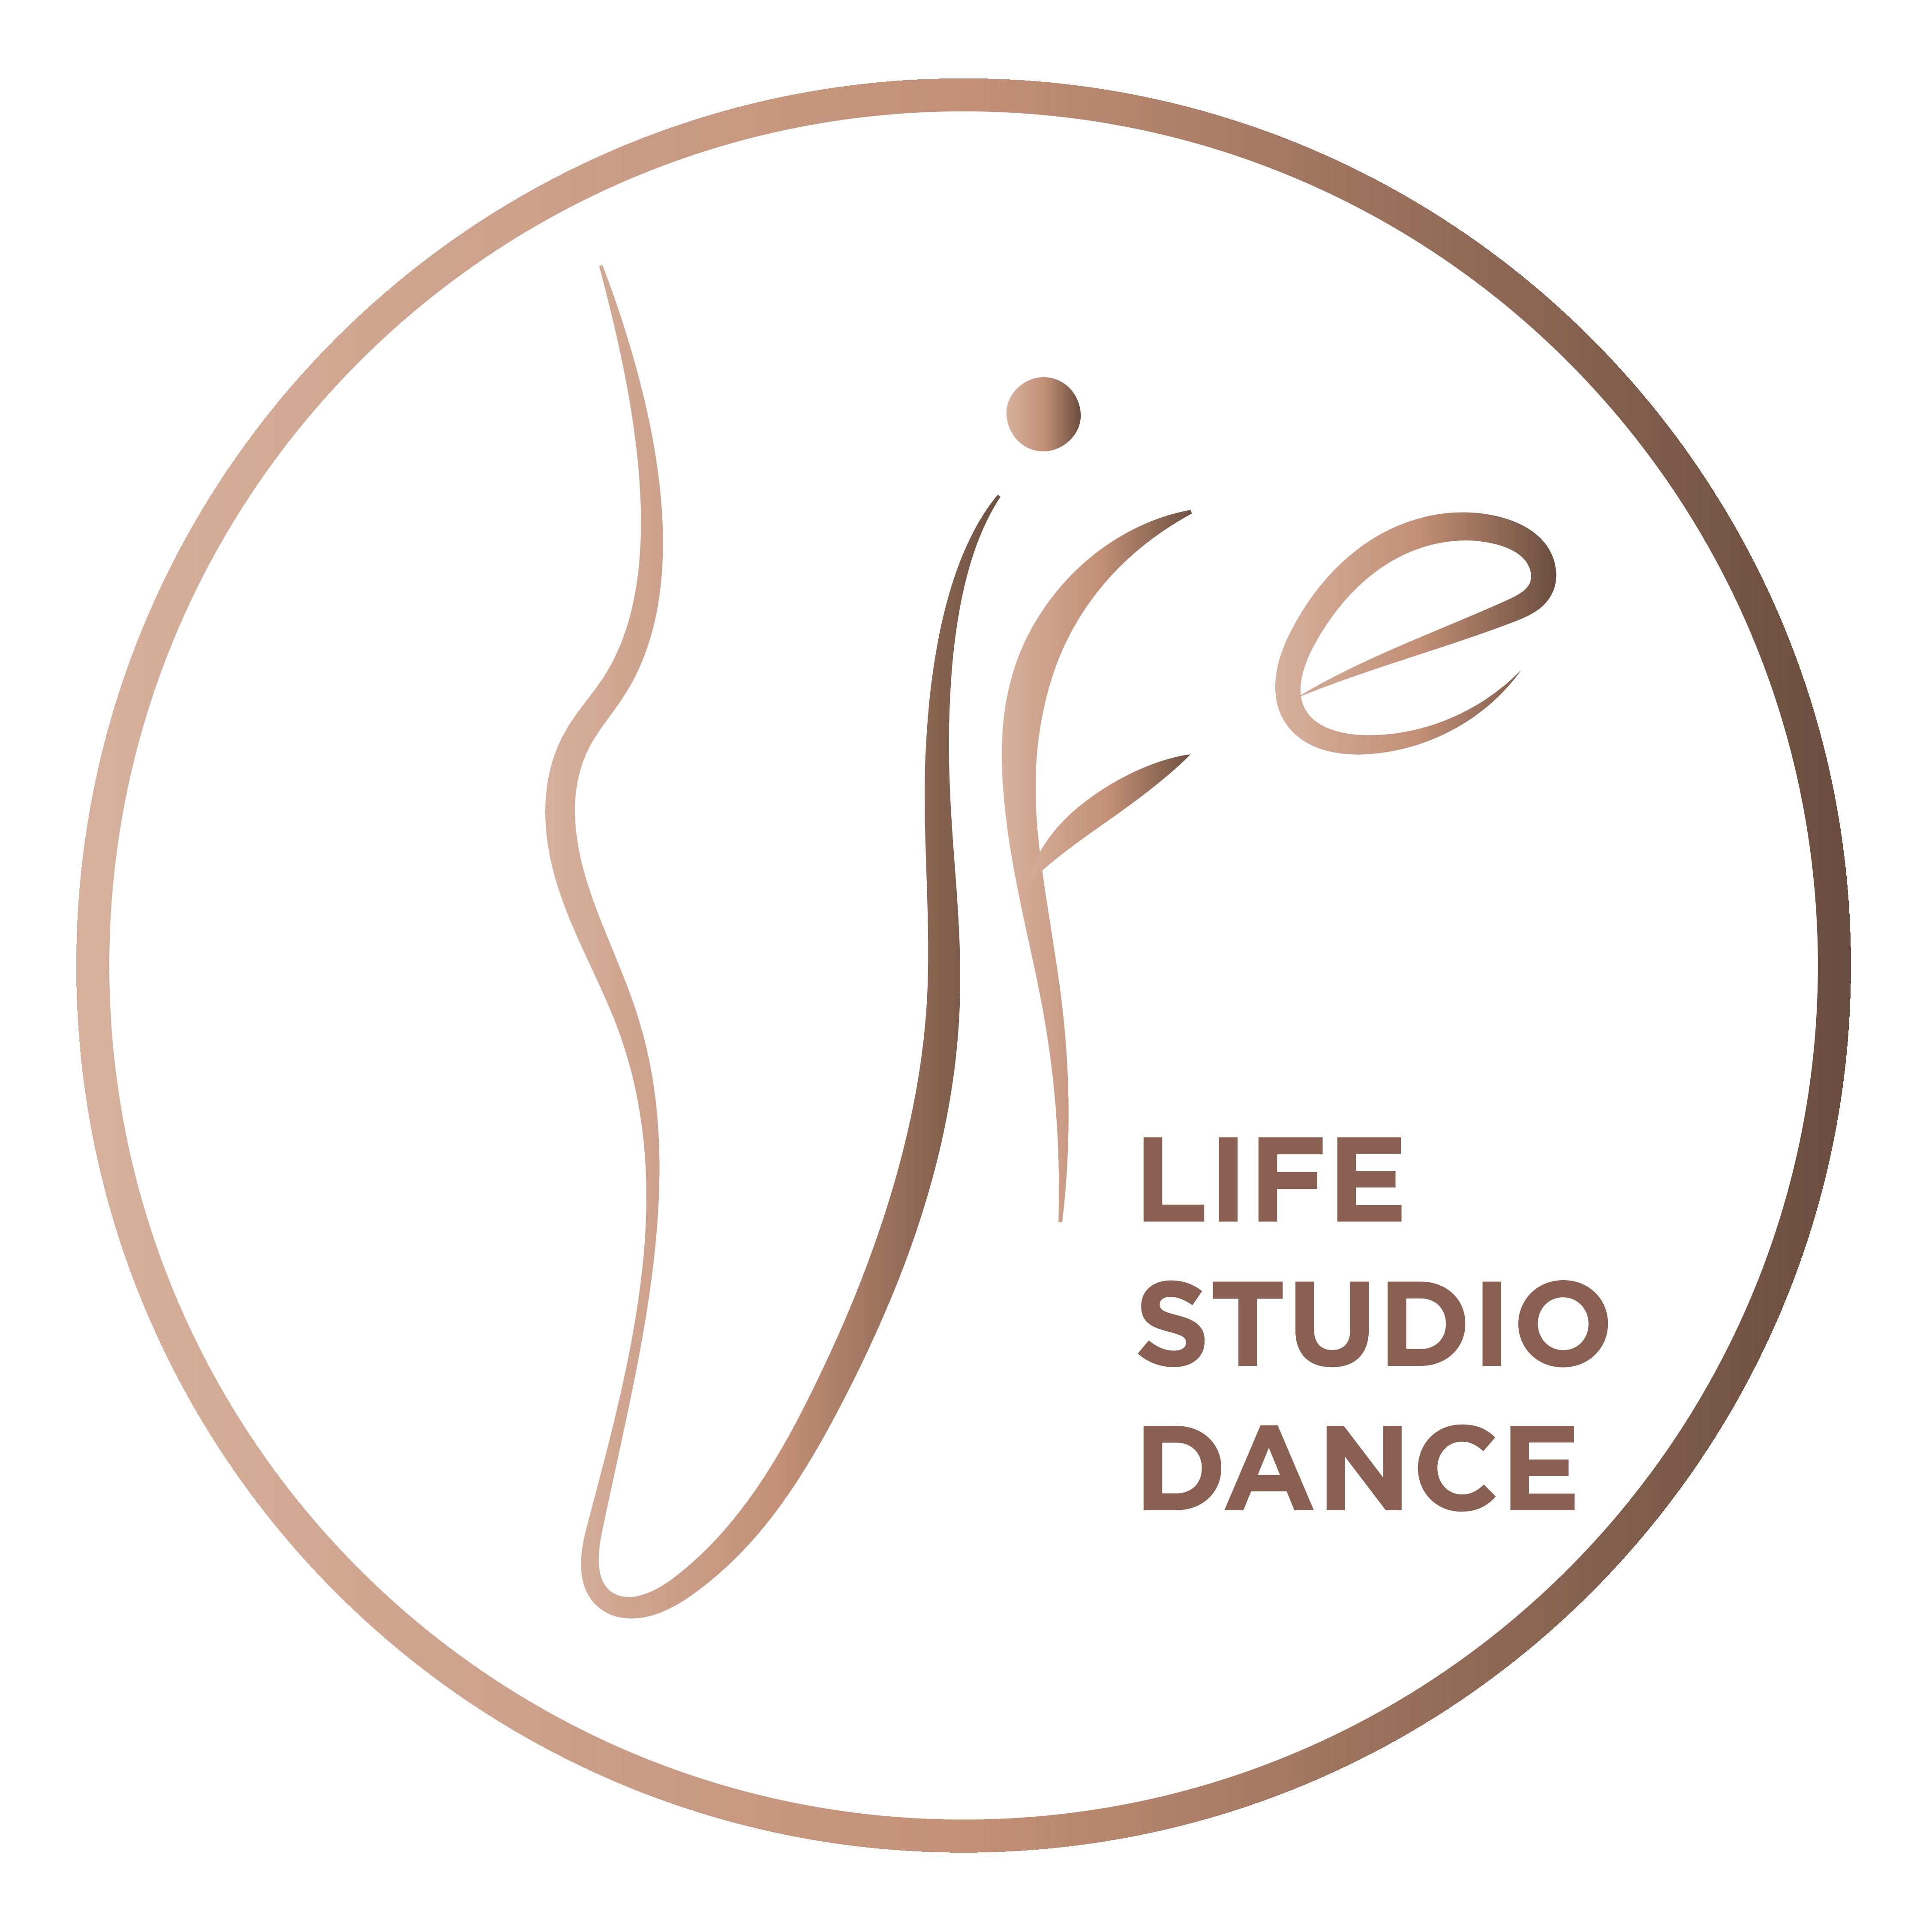 Life Studio Dance